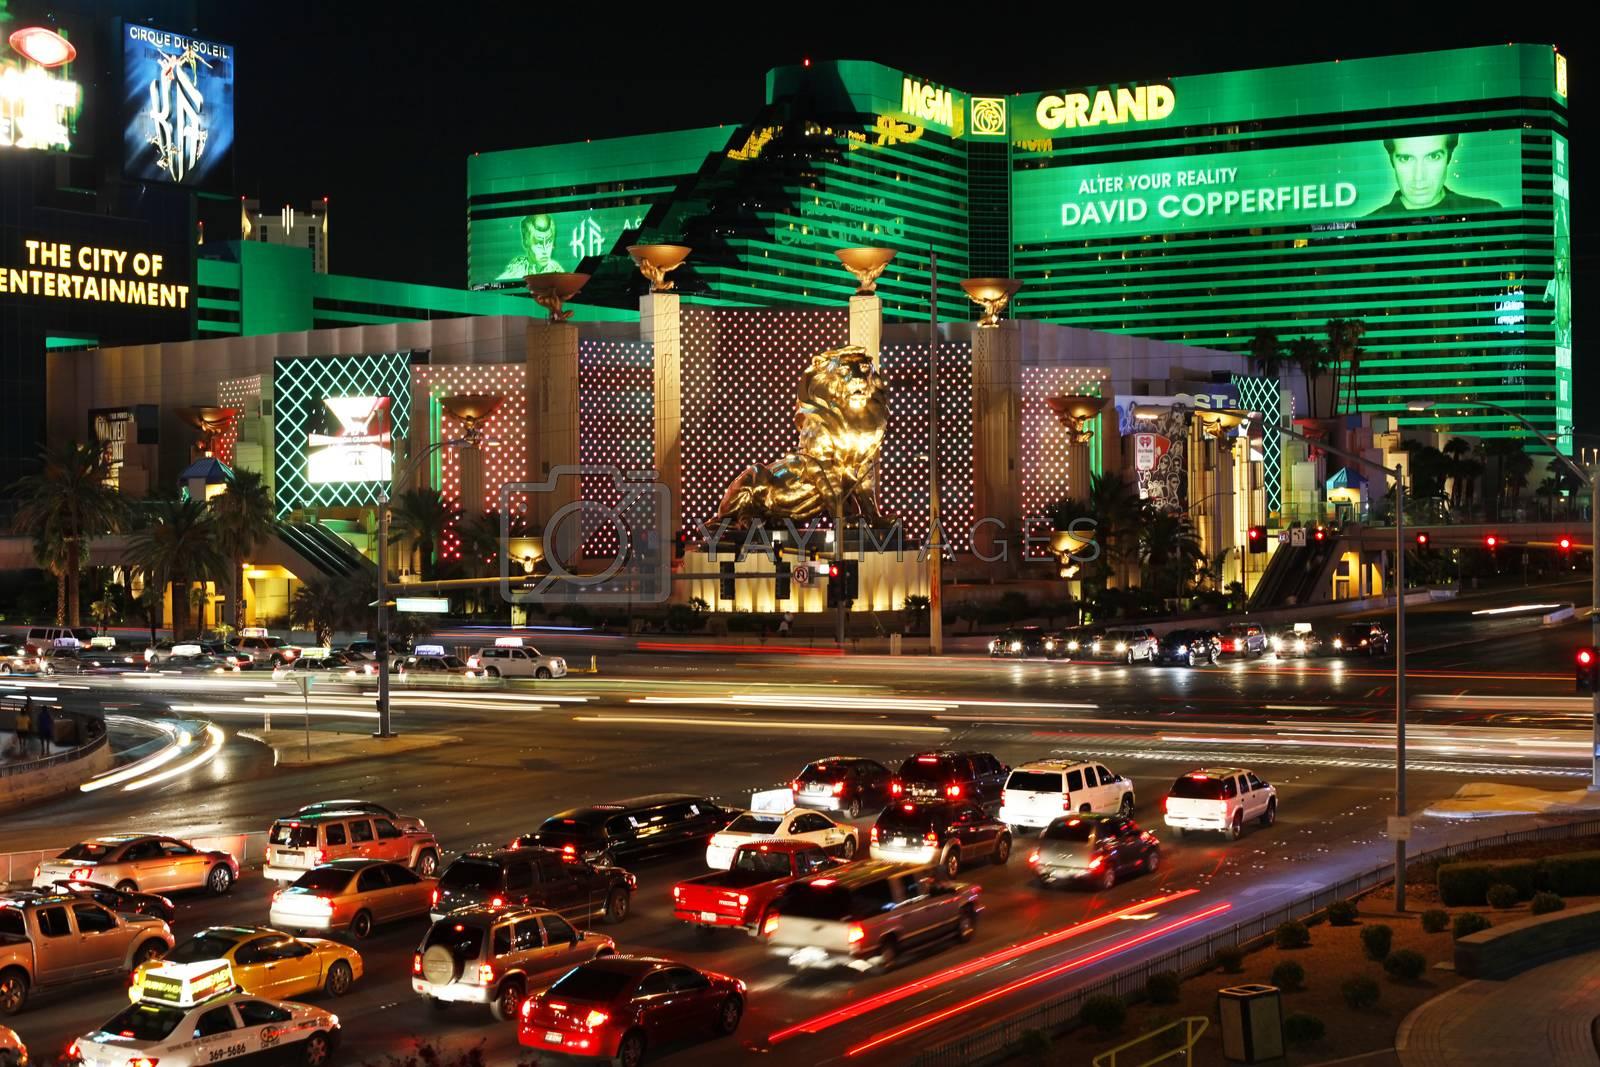 LAS VEGAS, NEVADA - September 19, 2011: MGM Grand Hotel on the strip on September 19, 2011 in Las Vegas, Nevada.